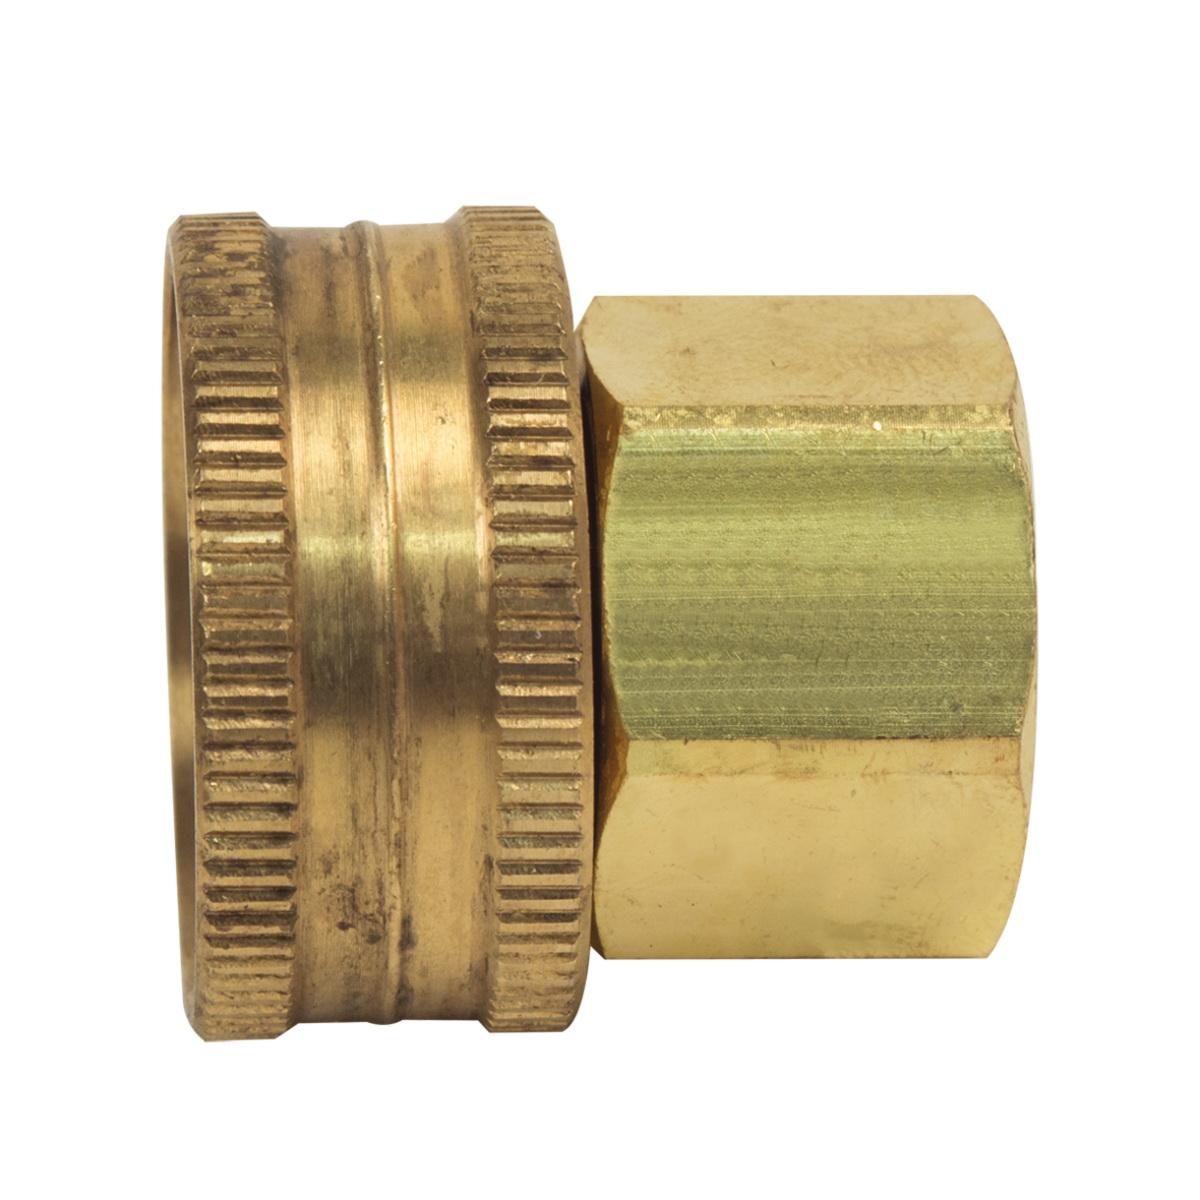 BrassCraft® HUS11-8-12 Rough Brass Hose Adapter, 1/2 in x 3/4 in, FHT x FIP